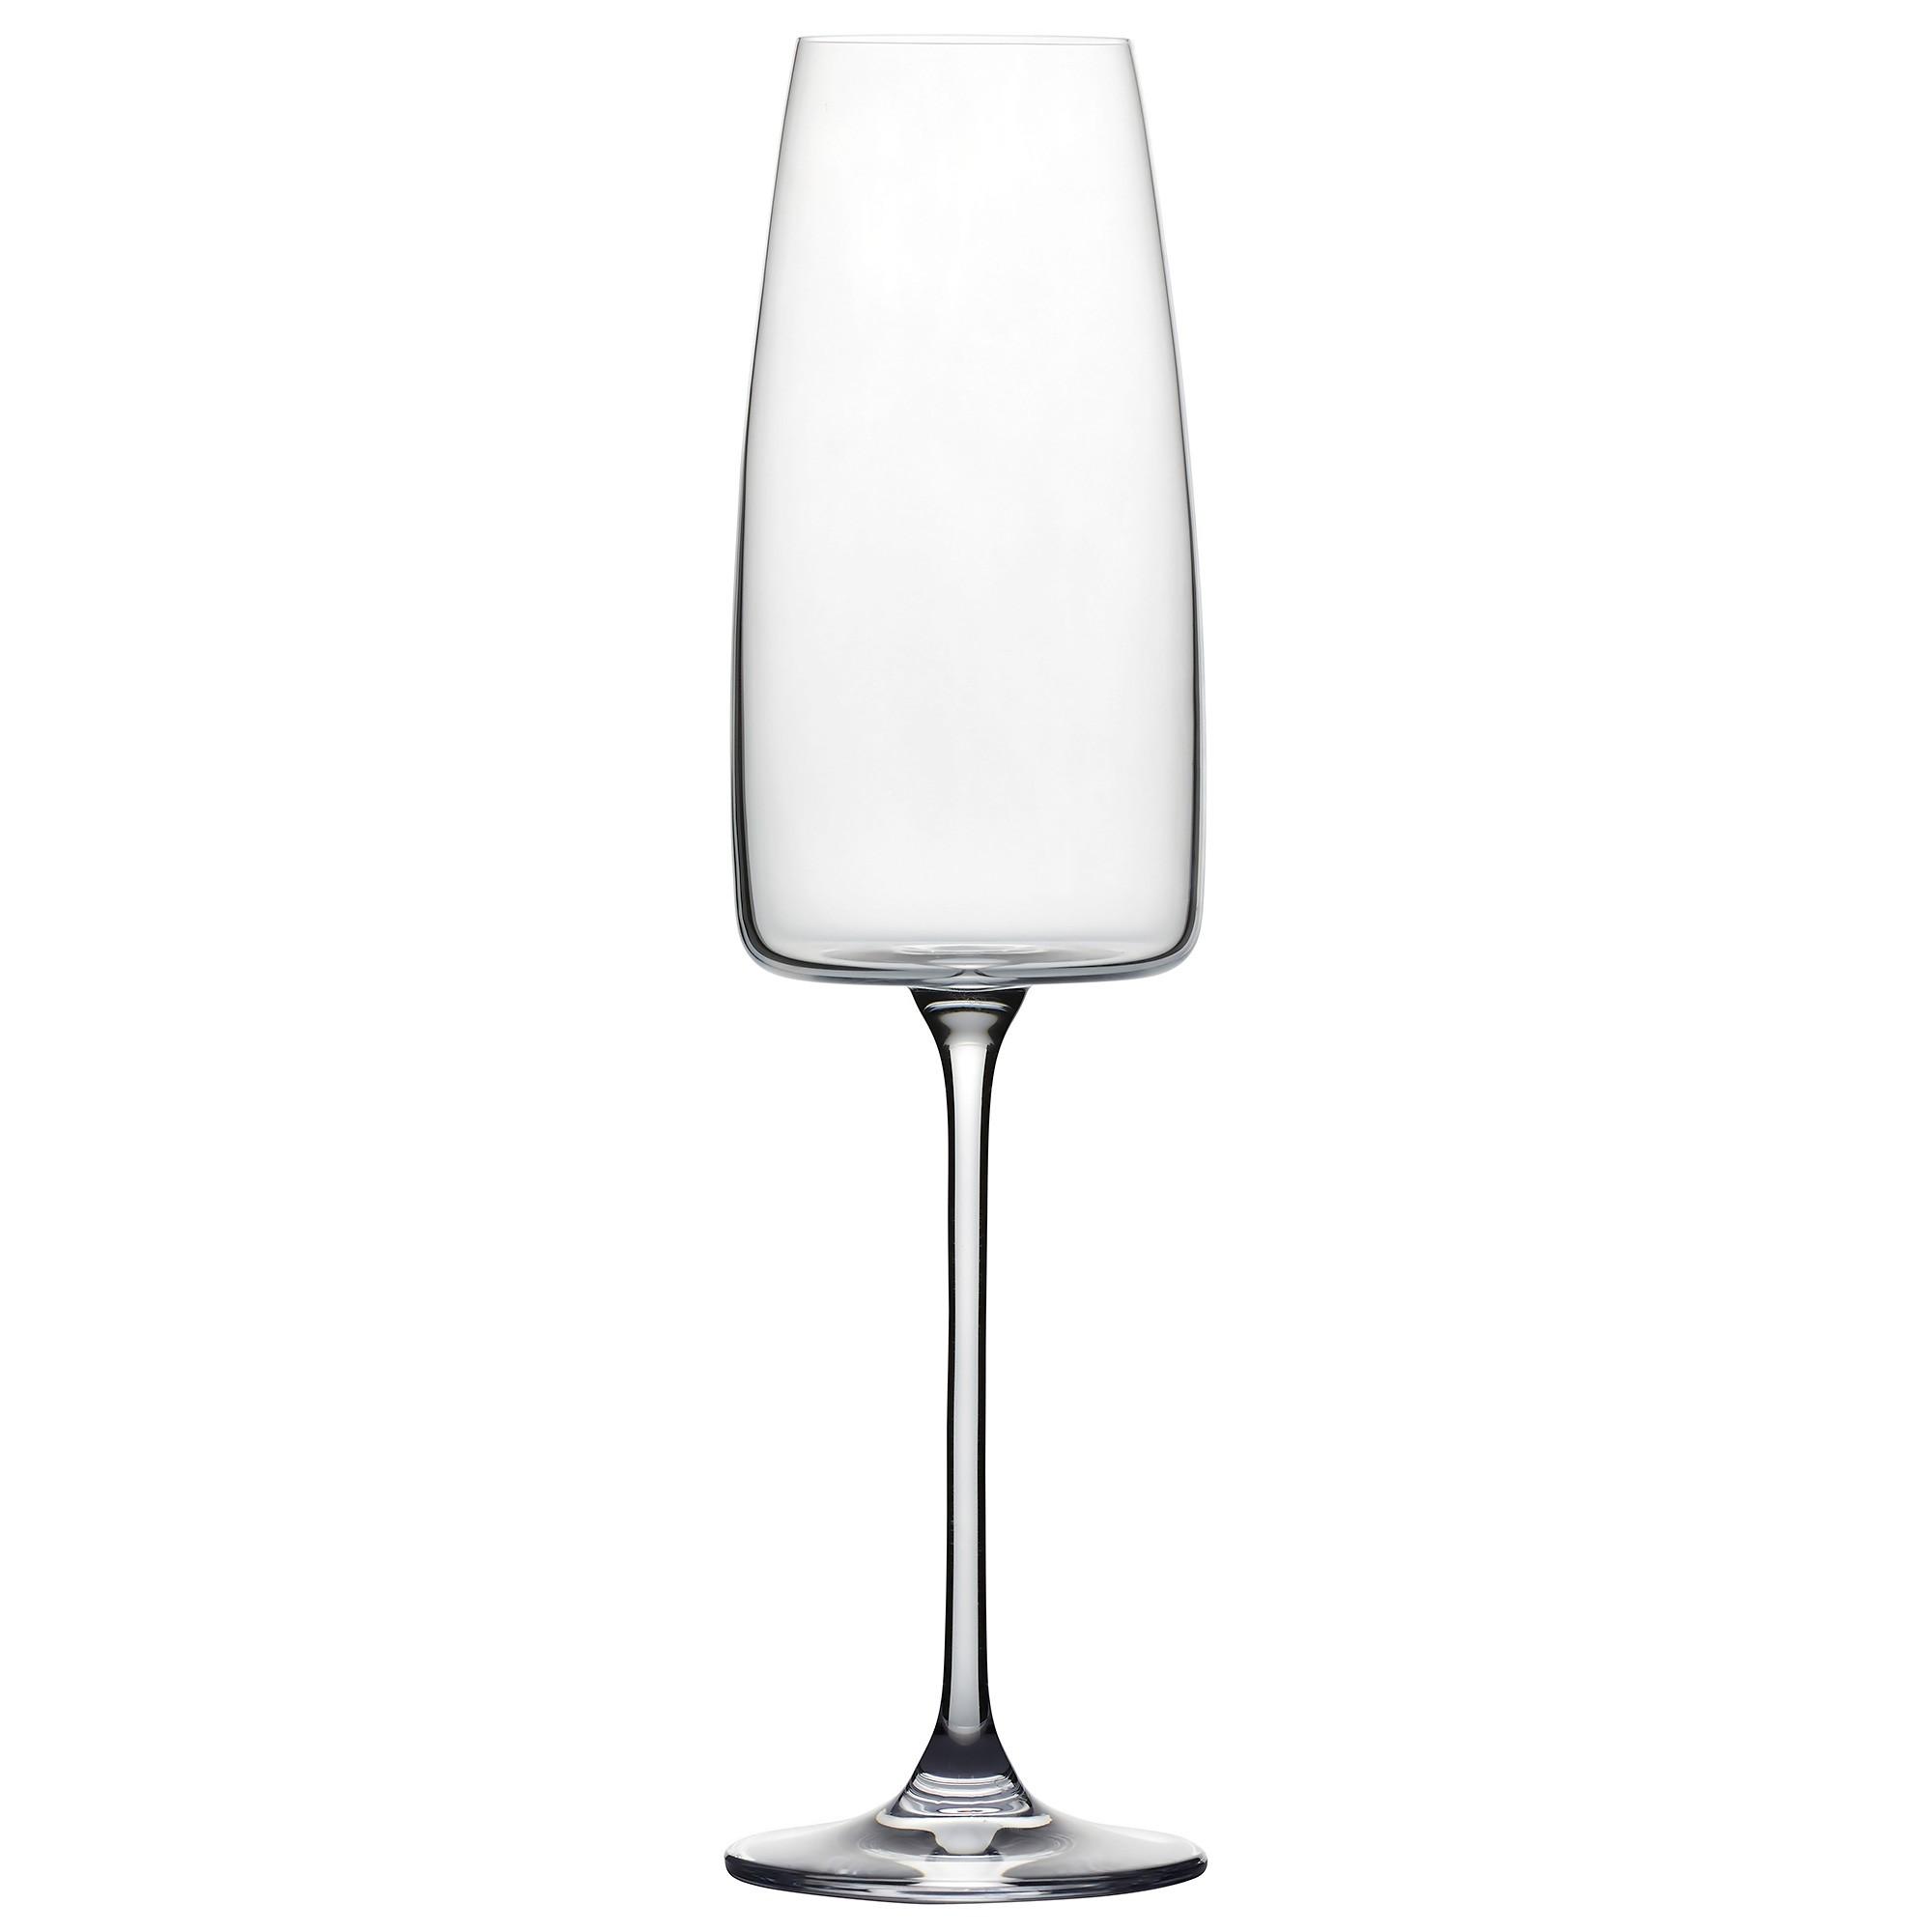 IVV Cortona Champagne Glass, Set of 6